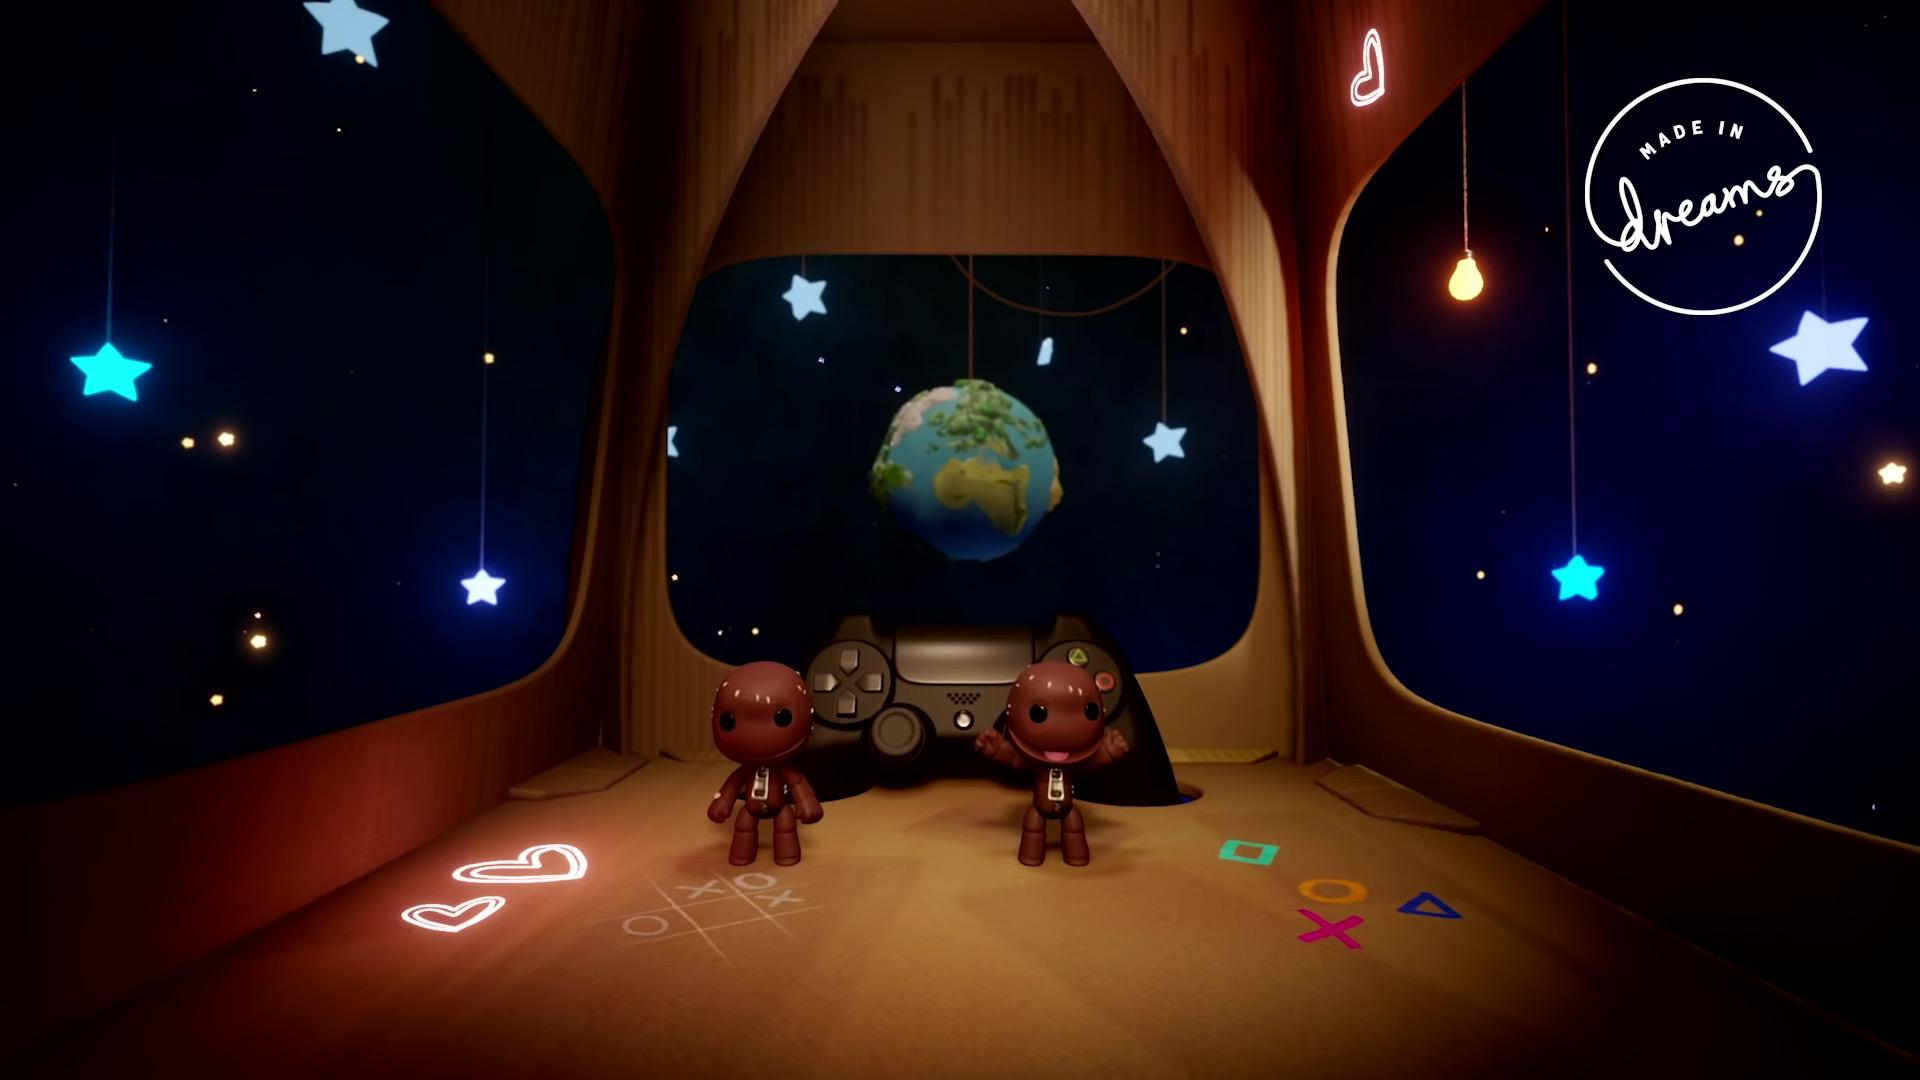 Media Molecule recreated a slice of LittleBigPlanet inside Dreams screenshot